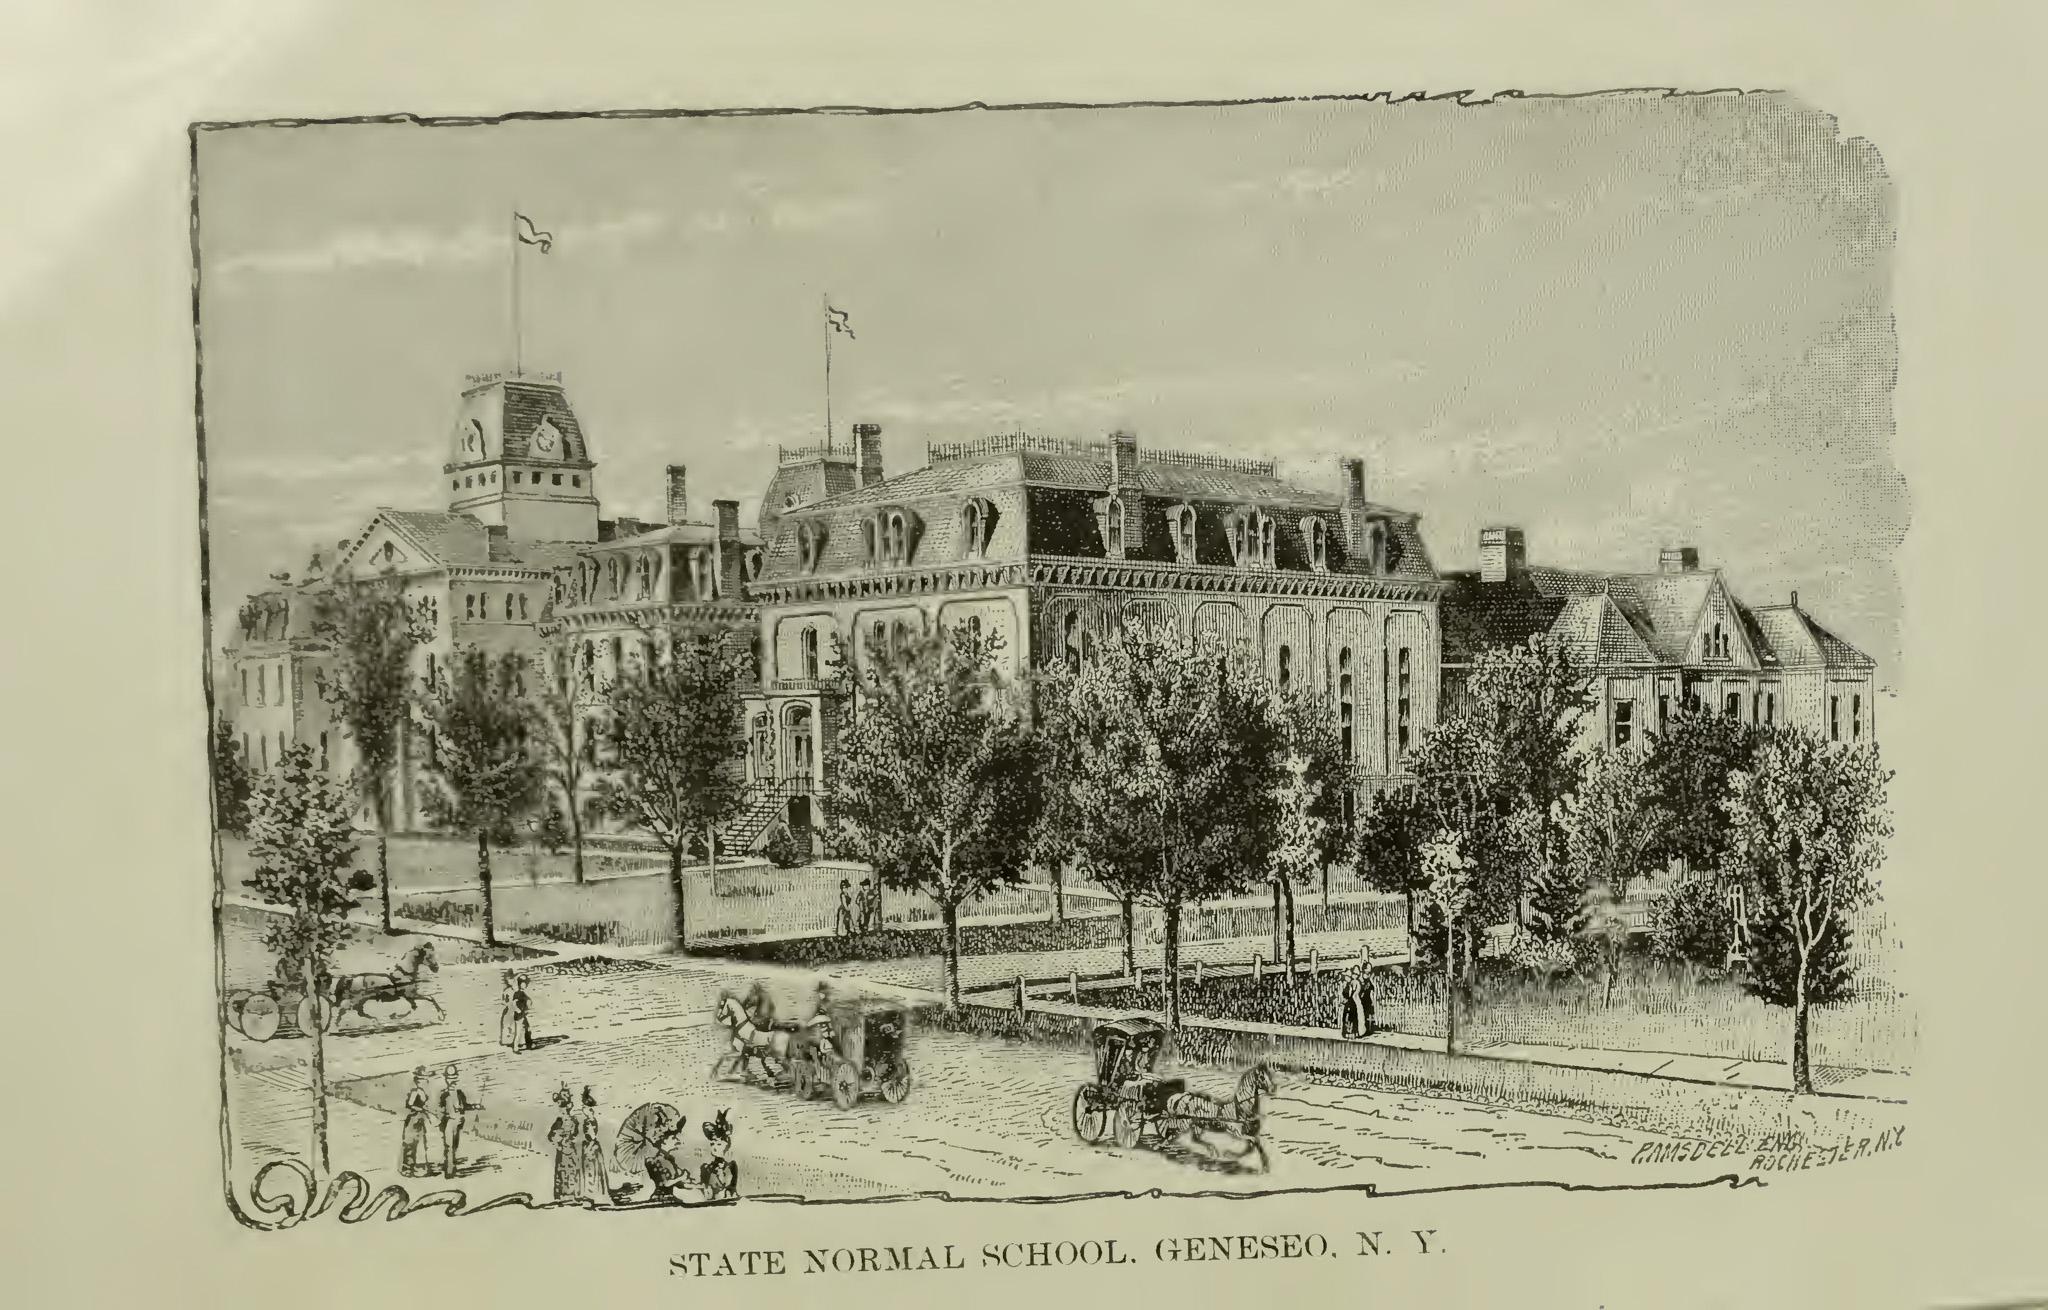 Geneseo State Normal School in 1893